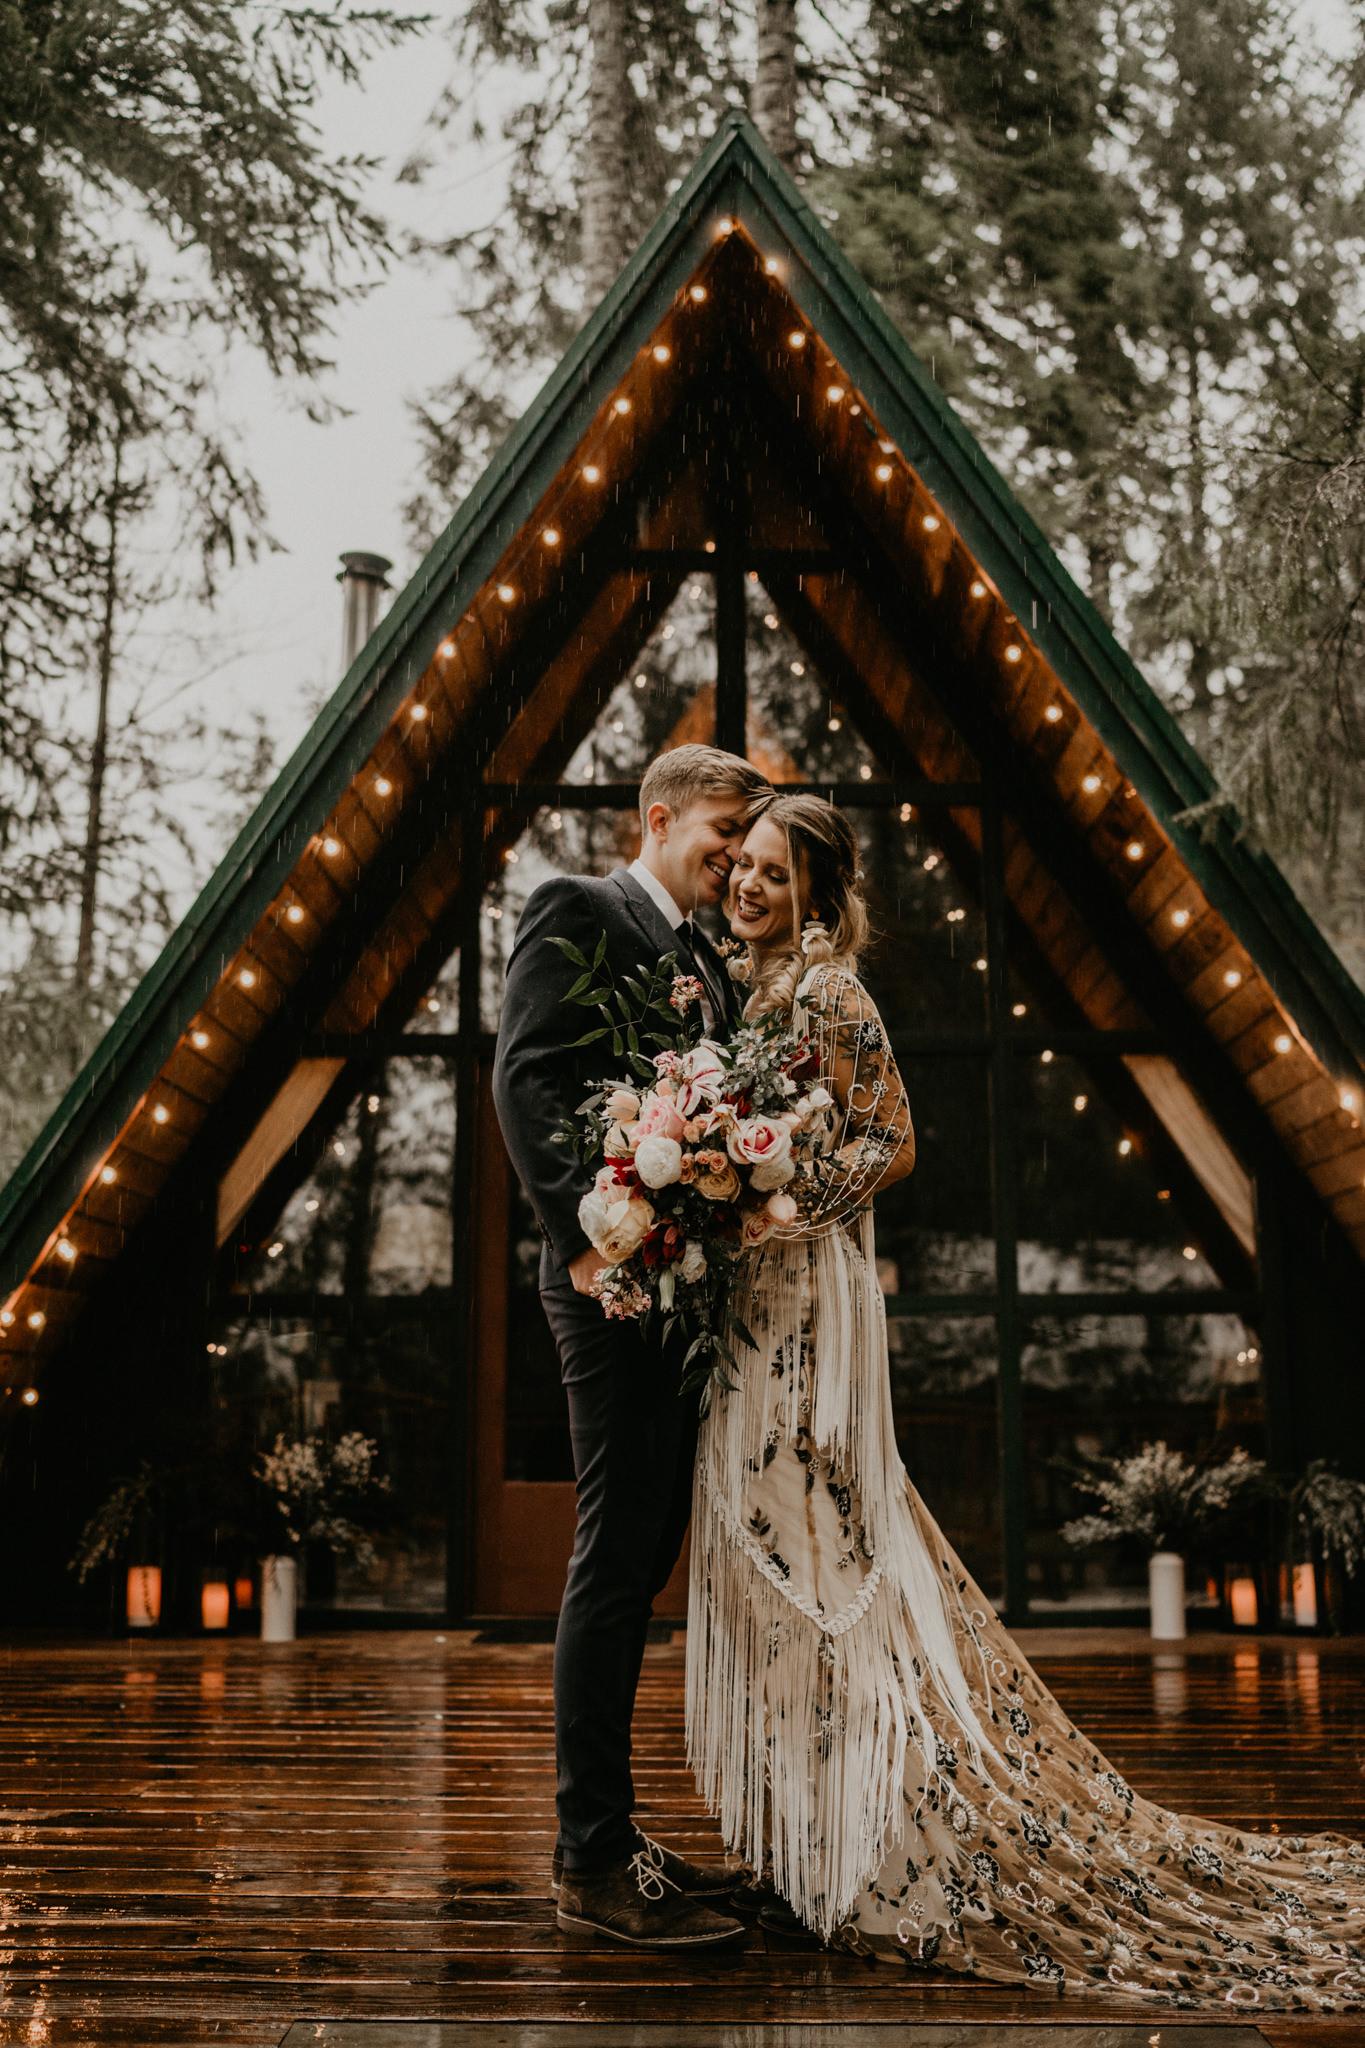 Mount-Rainier-Elopement-PNW-Intimate-Rain-Cabin-Seattle-Wedding-National-Park-Portland-Oregon-Pacific-Northwest-Outdoor-30